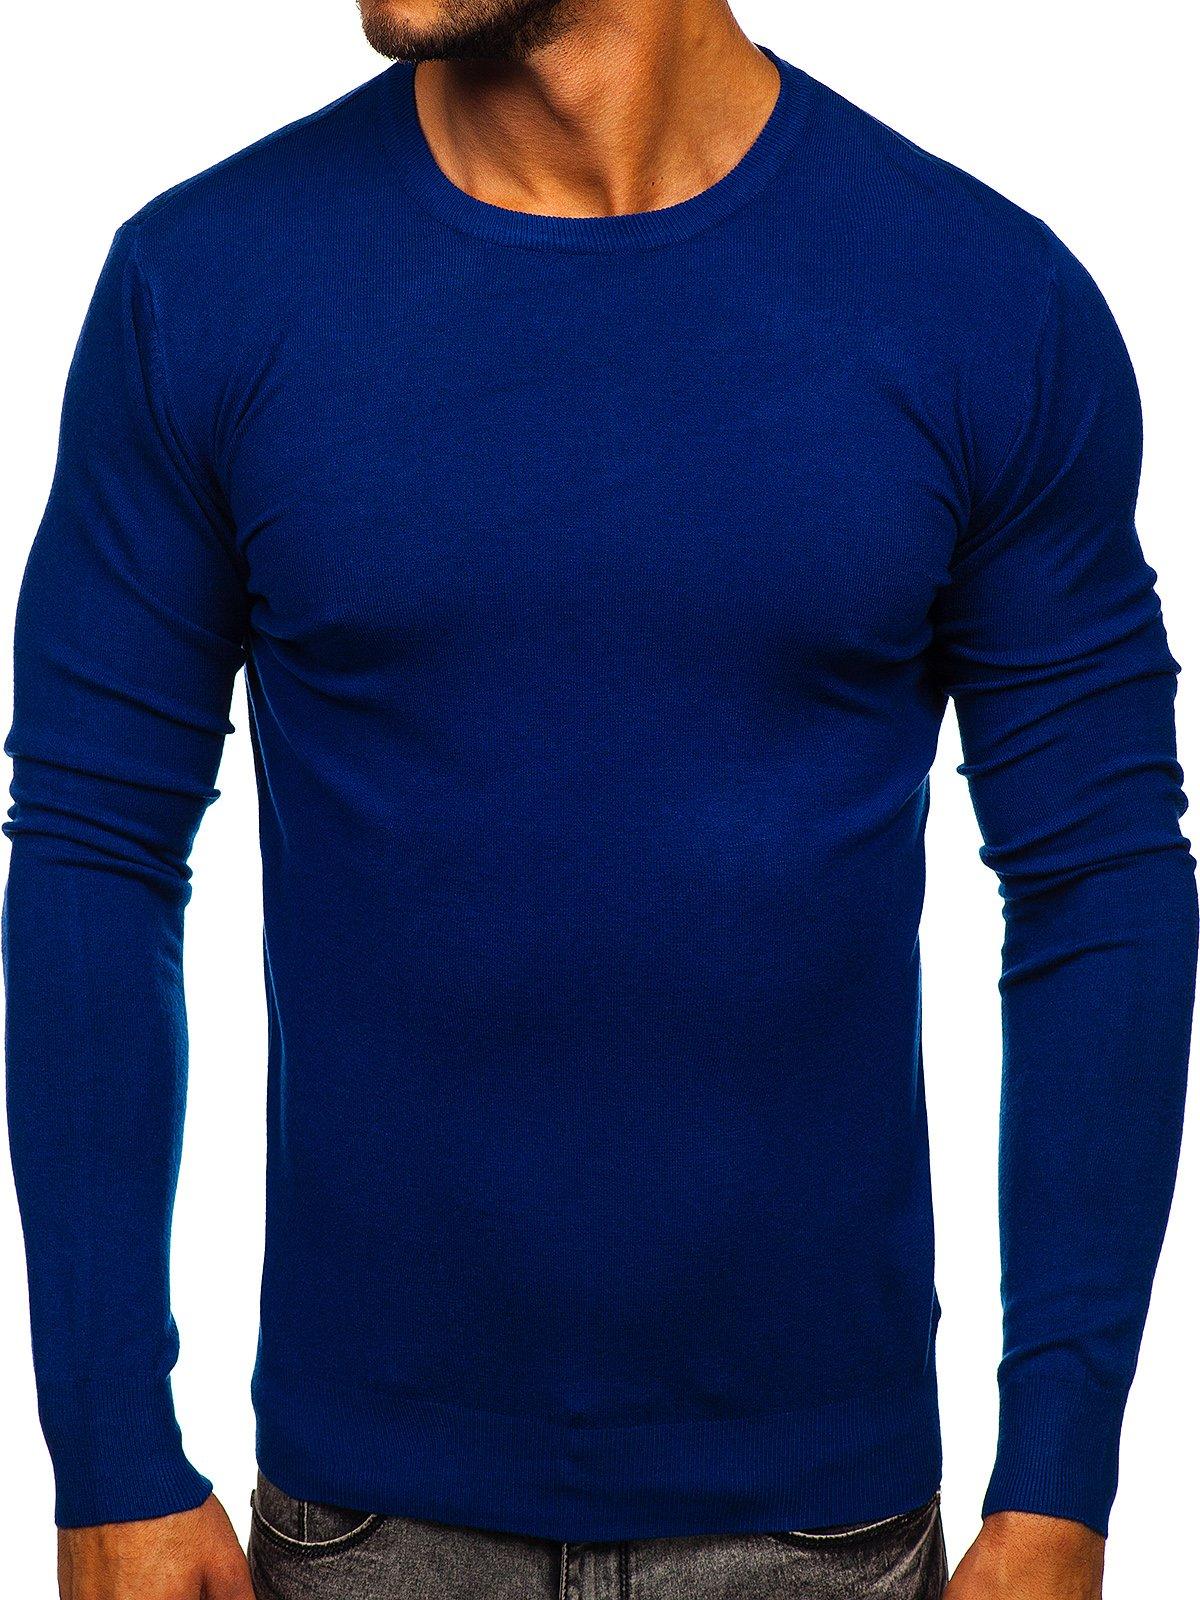 Pulover albastru bărbați Bolf YY01